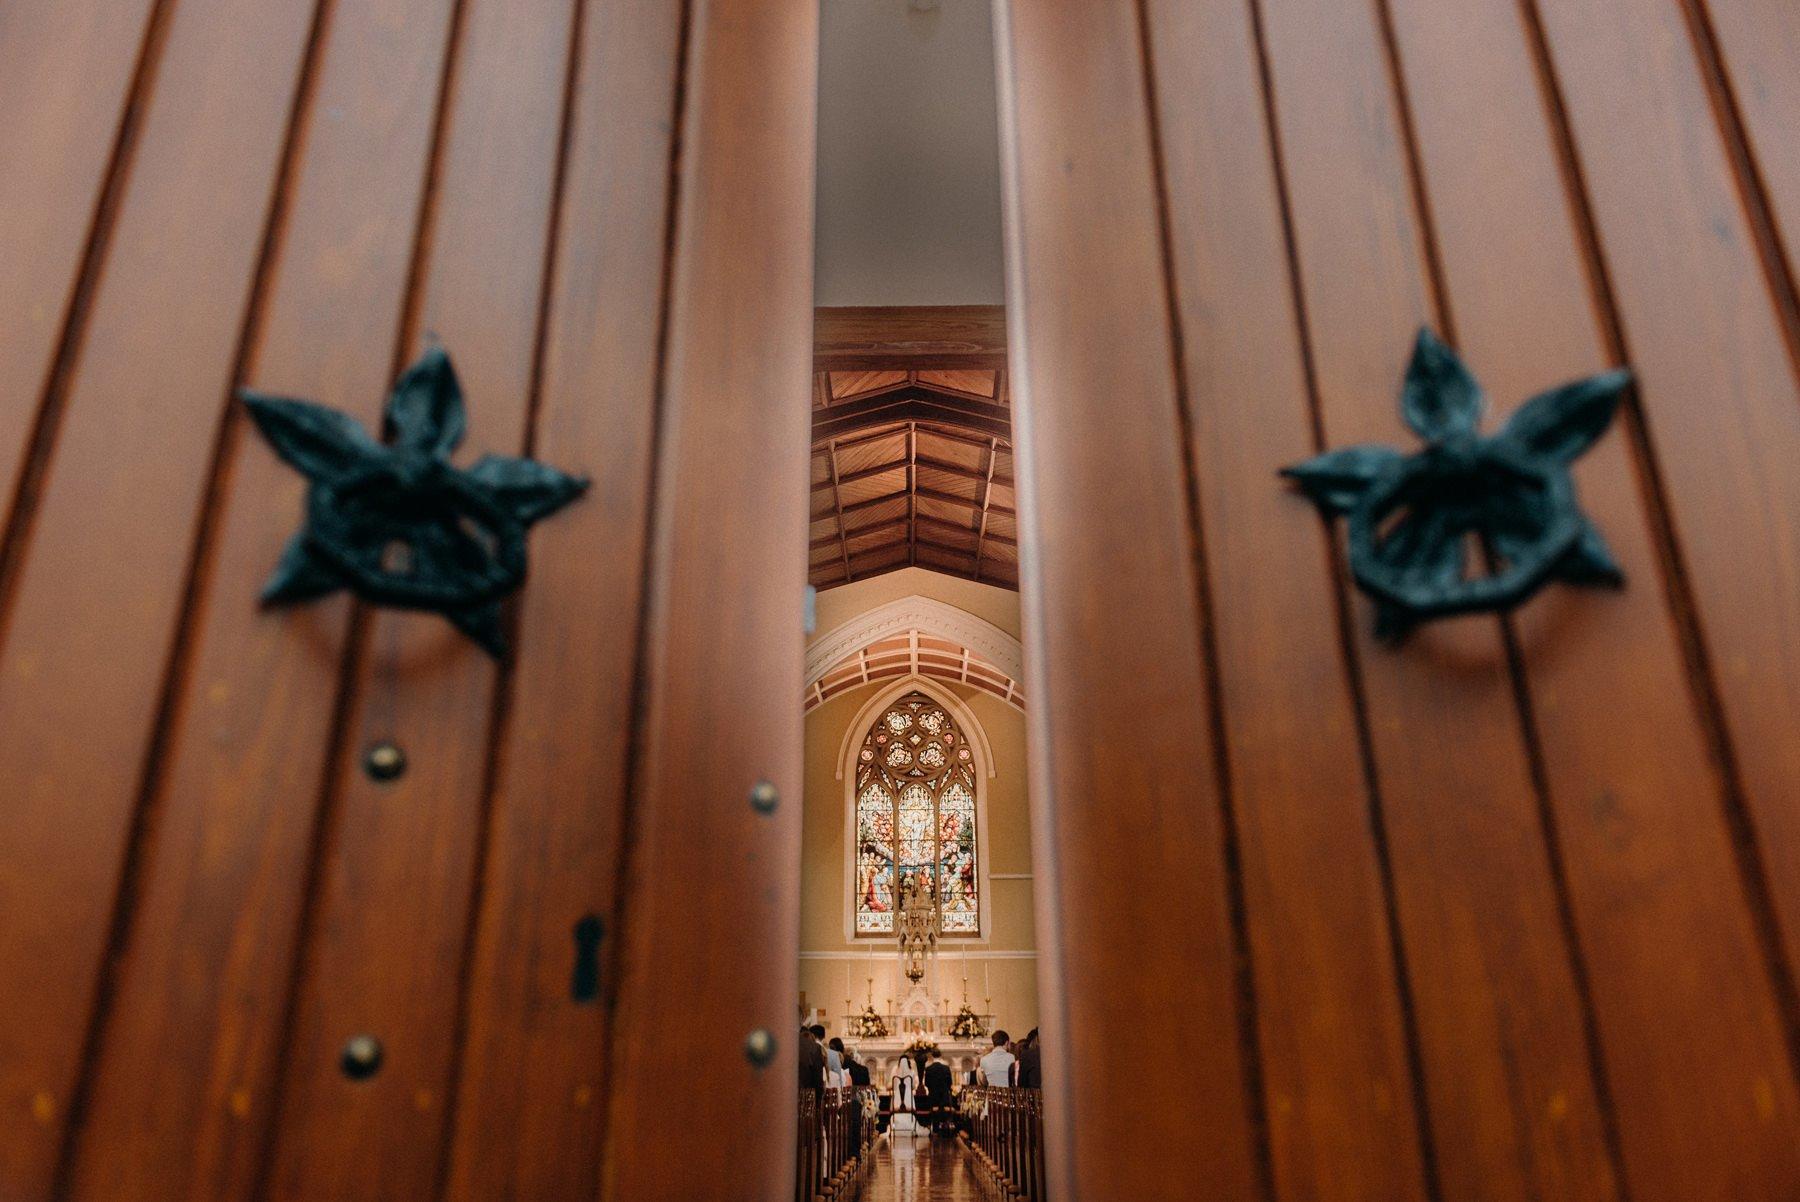 segrave-barns-wedding-in-ireland-church-ceremony